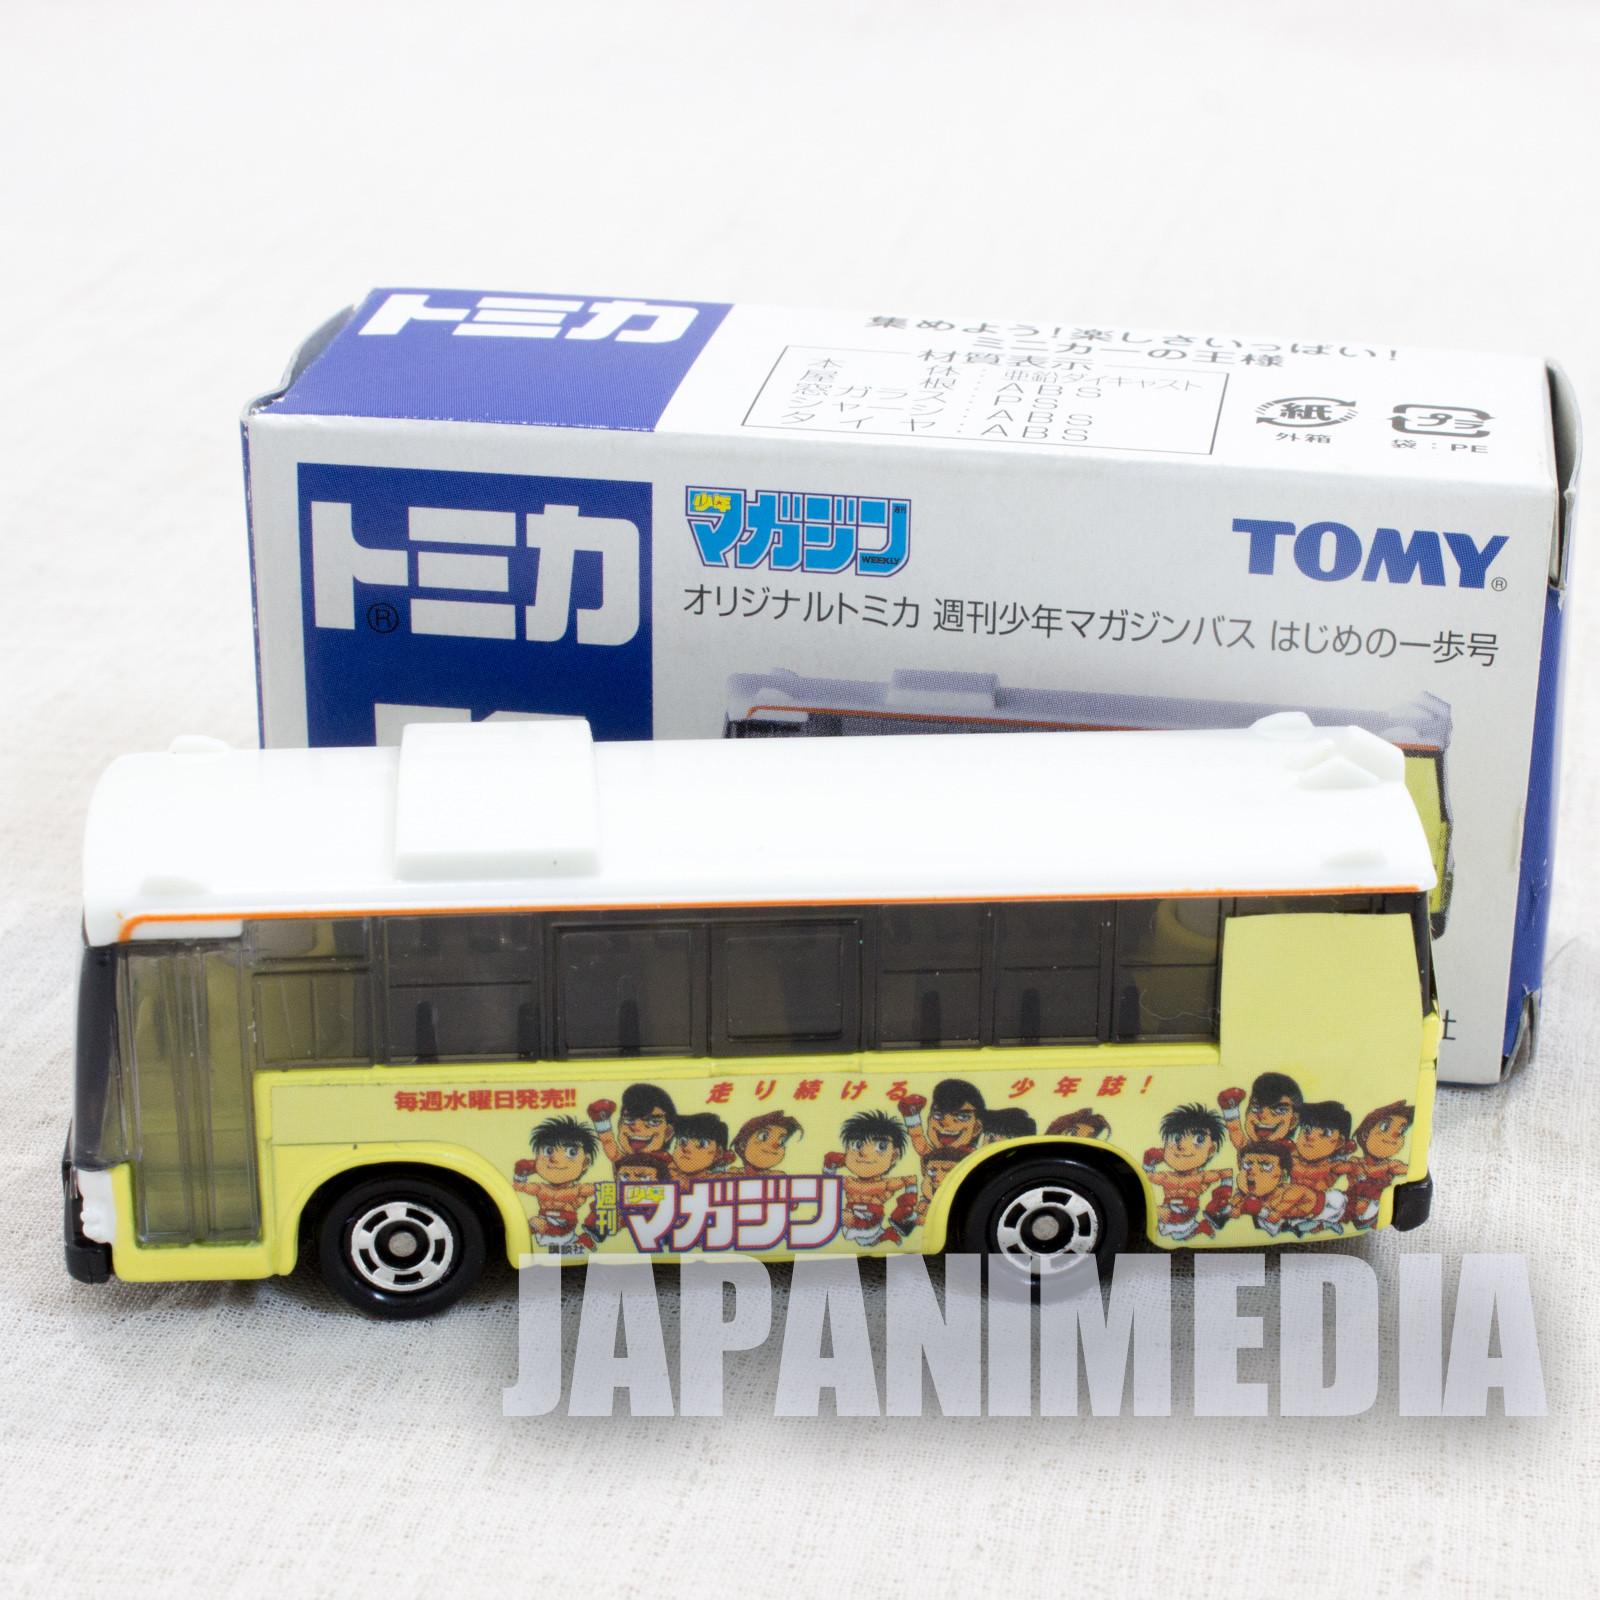 Tomica Weekly Shonen Magazine Hajime no Ippo Fighting Spirit Mini Toy Car Tomy